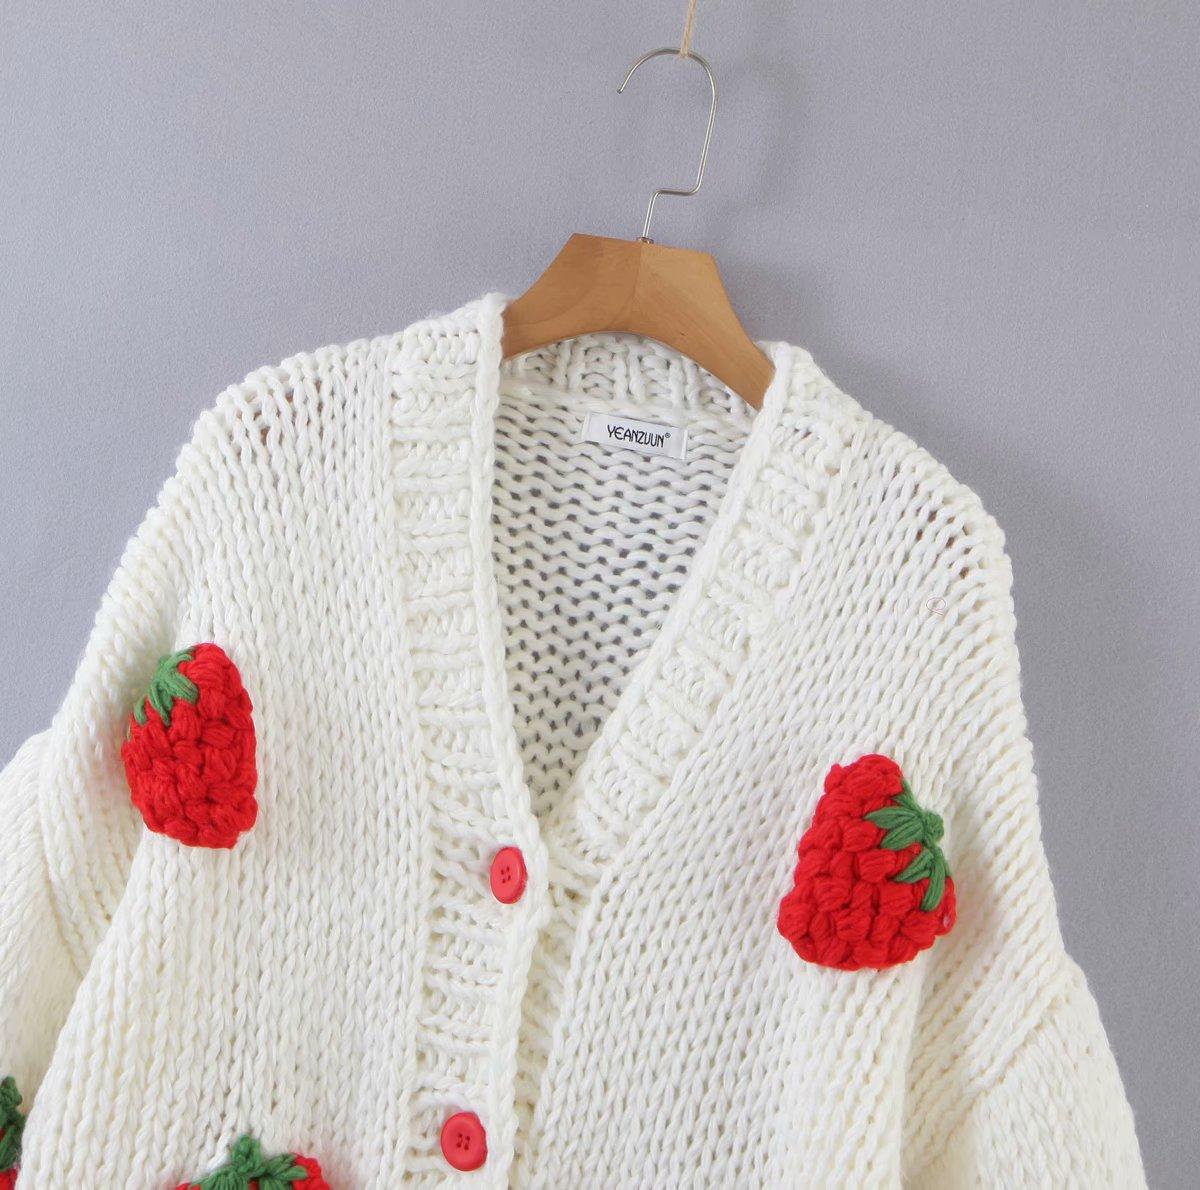 High Quality Sweater Women Knitwear American Ins Retro Handmade Knitted Cardigan Three-dimensional Cartoon Crochet Thick Coat enlarge